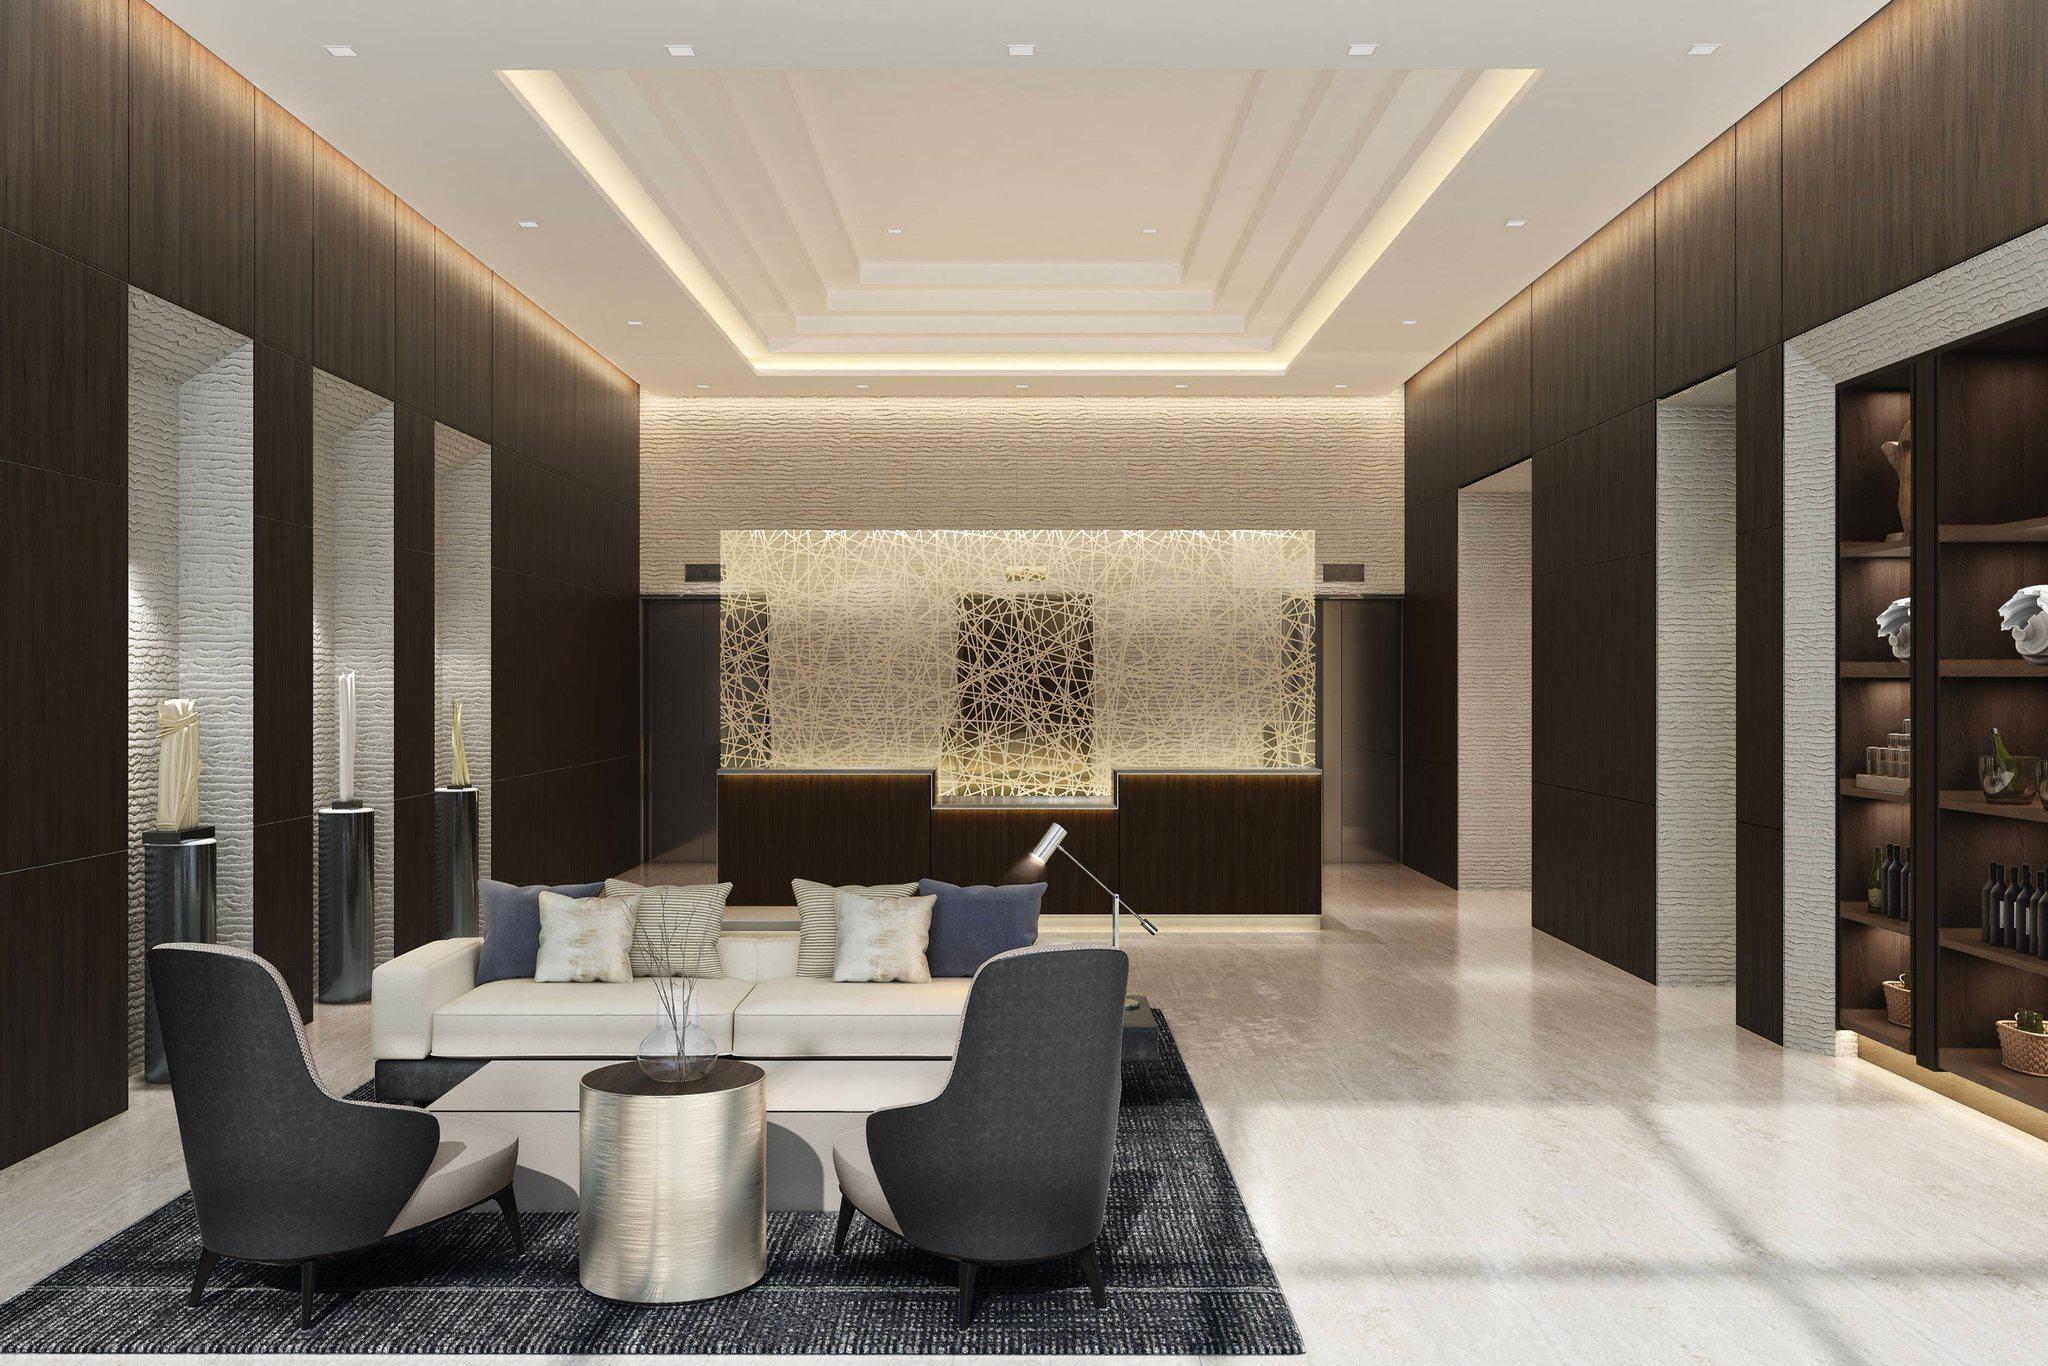 AC Hotel by Marriott Miami Dadeland